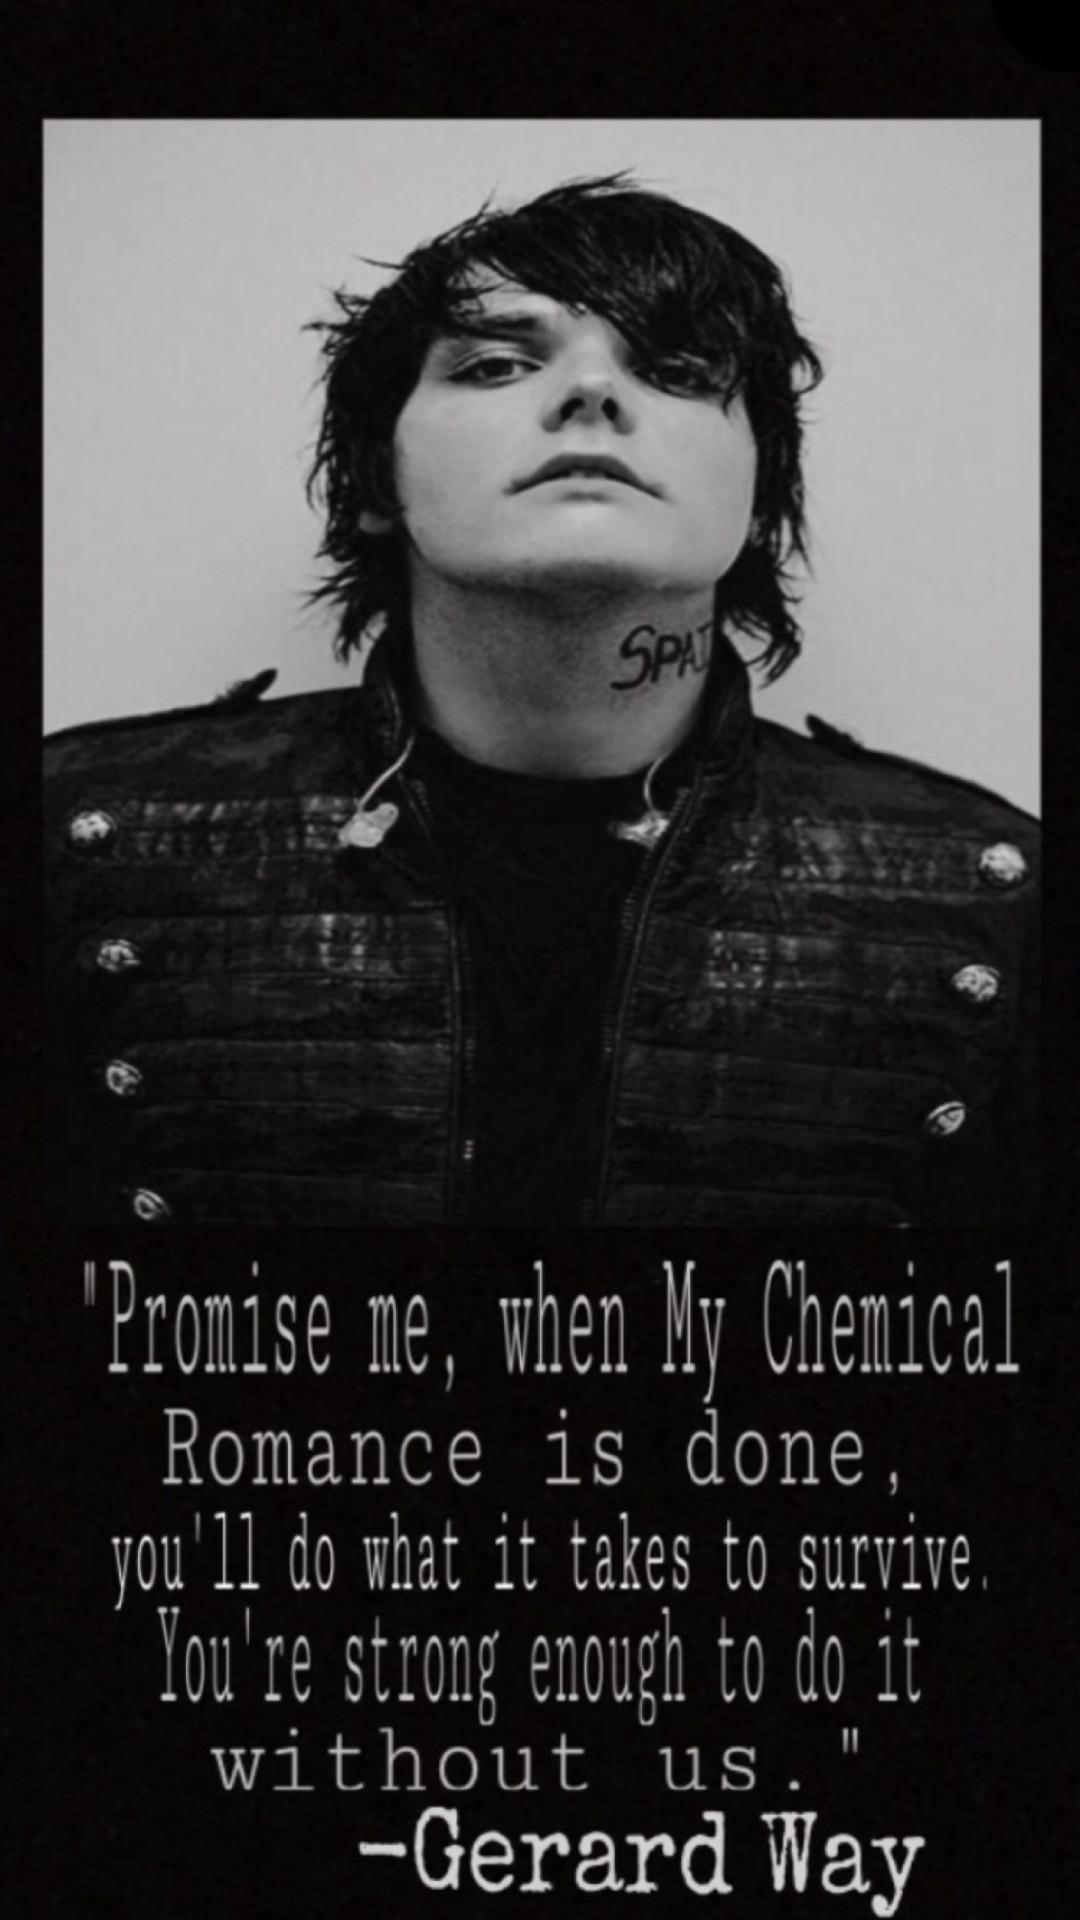 my chemical romance my chemical romance lockscreen my chemical romance edit my  chemical romance wallpaper mcr